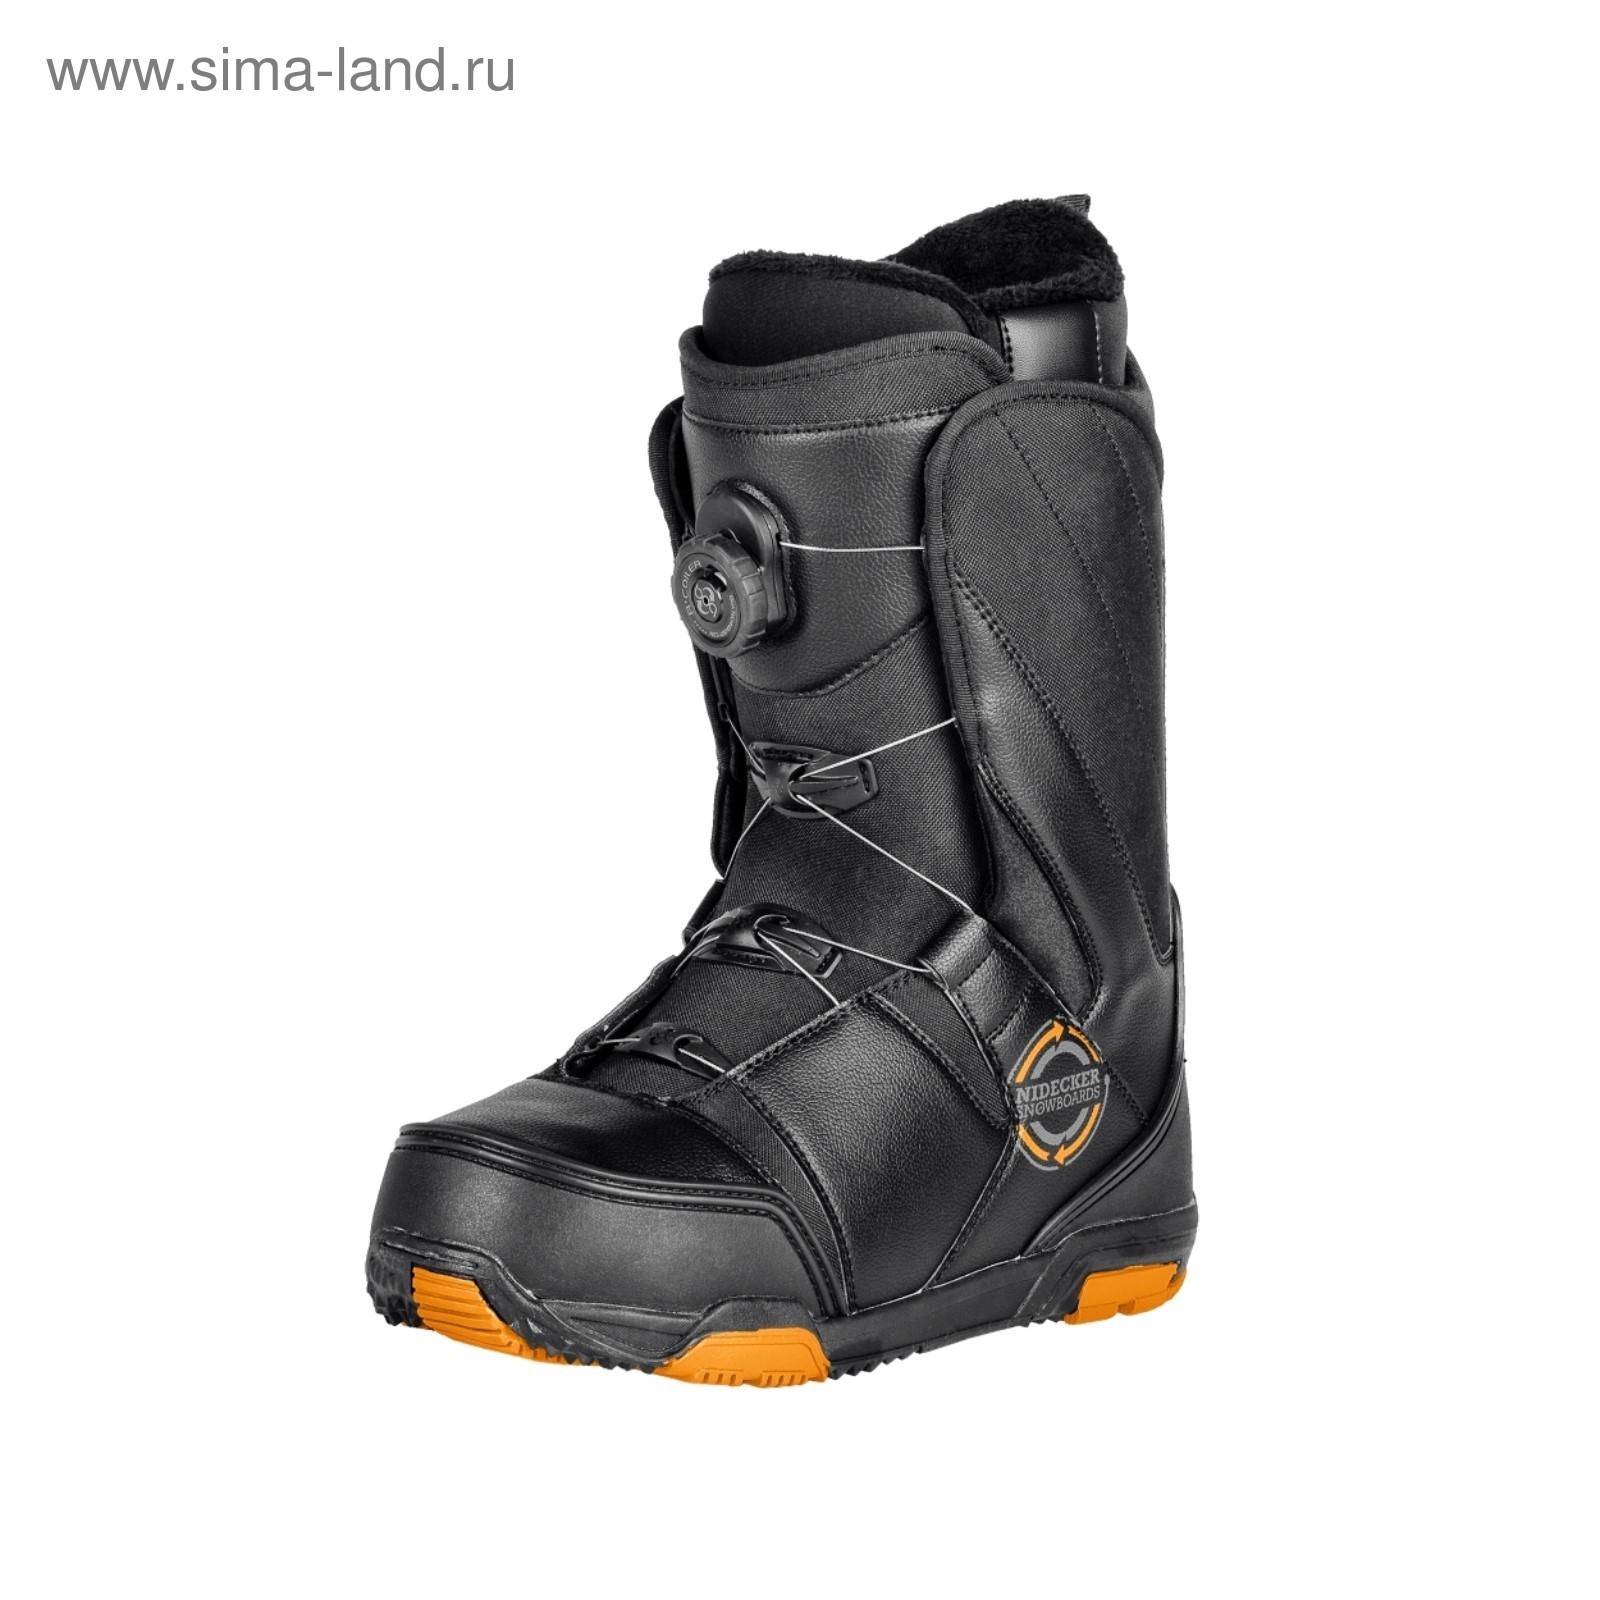 Ботинки для сноуборда NIDECKER BOA COILER RENTAL BLACK, размер 28,5 ... 532cb69f3d4